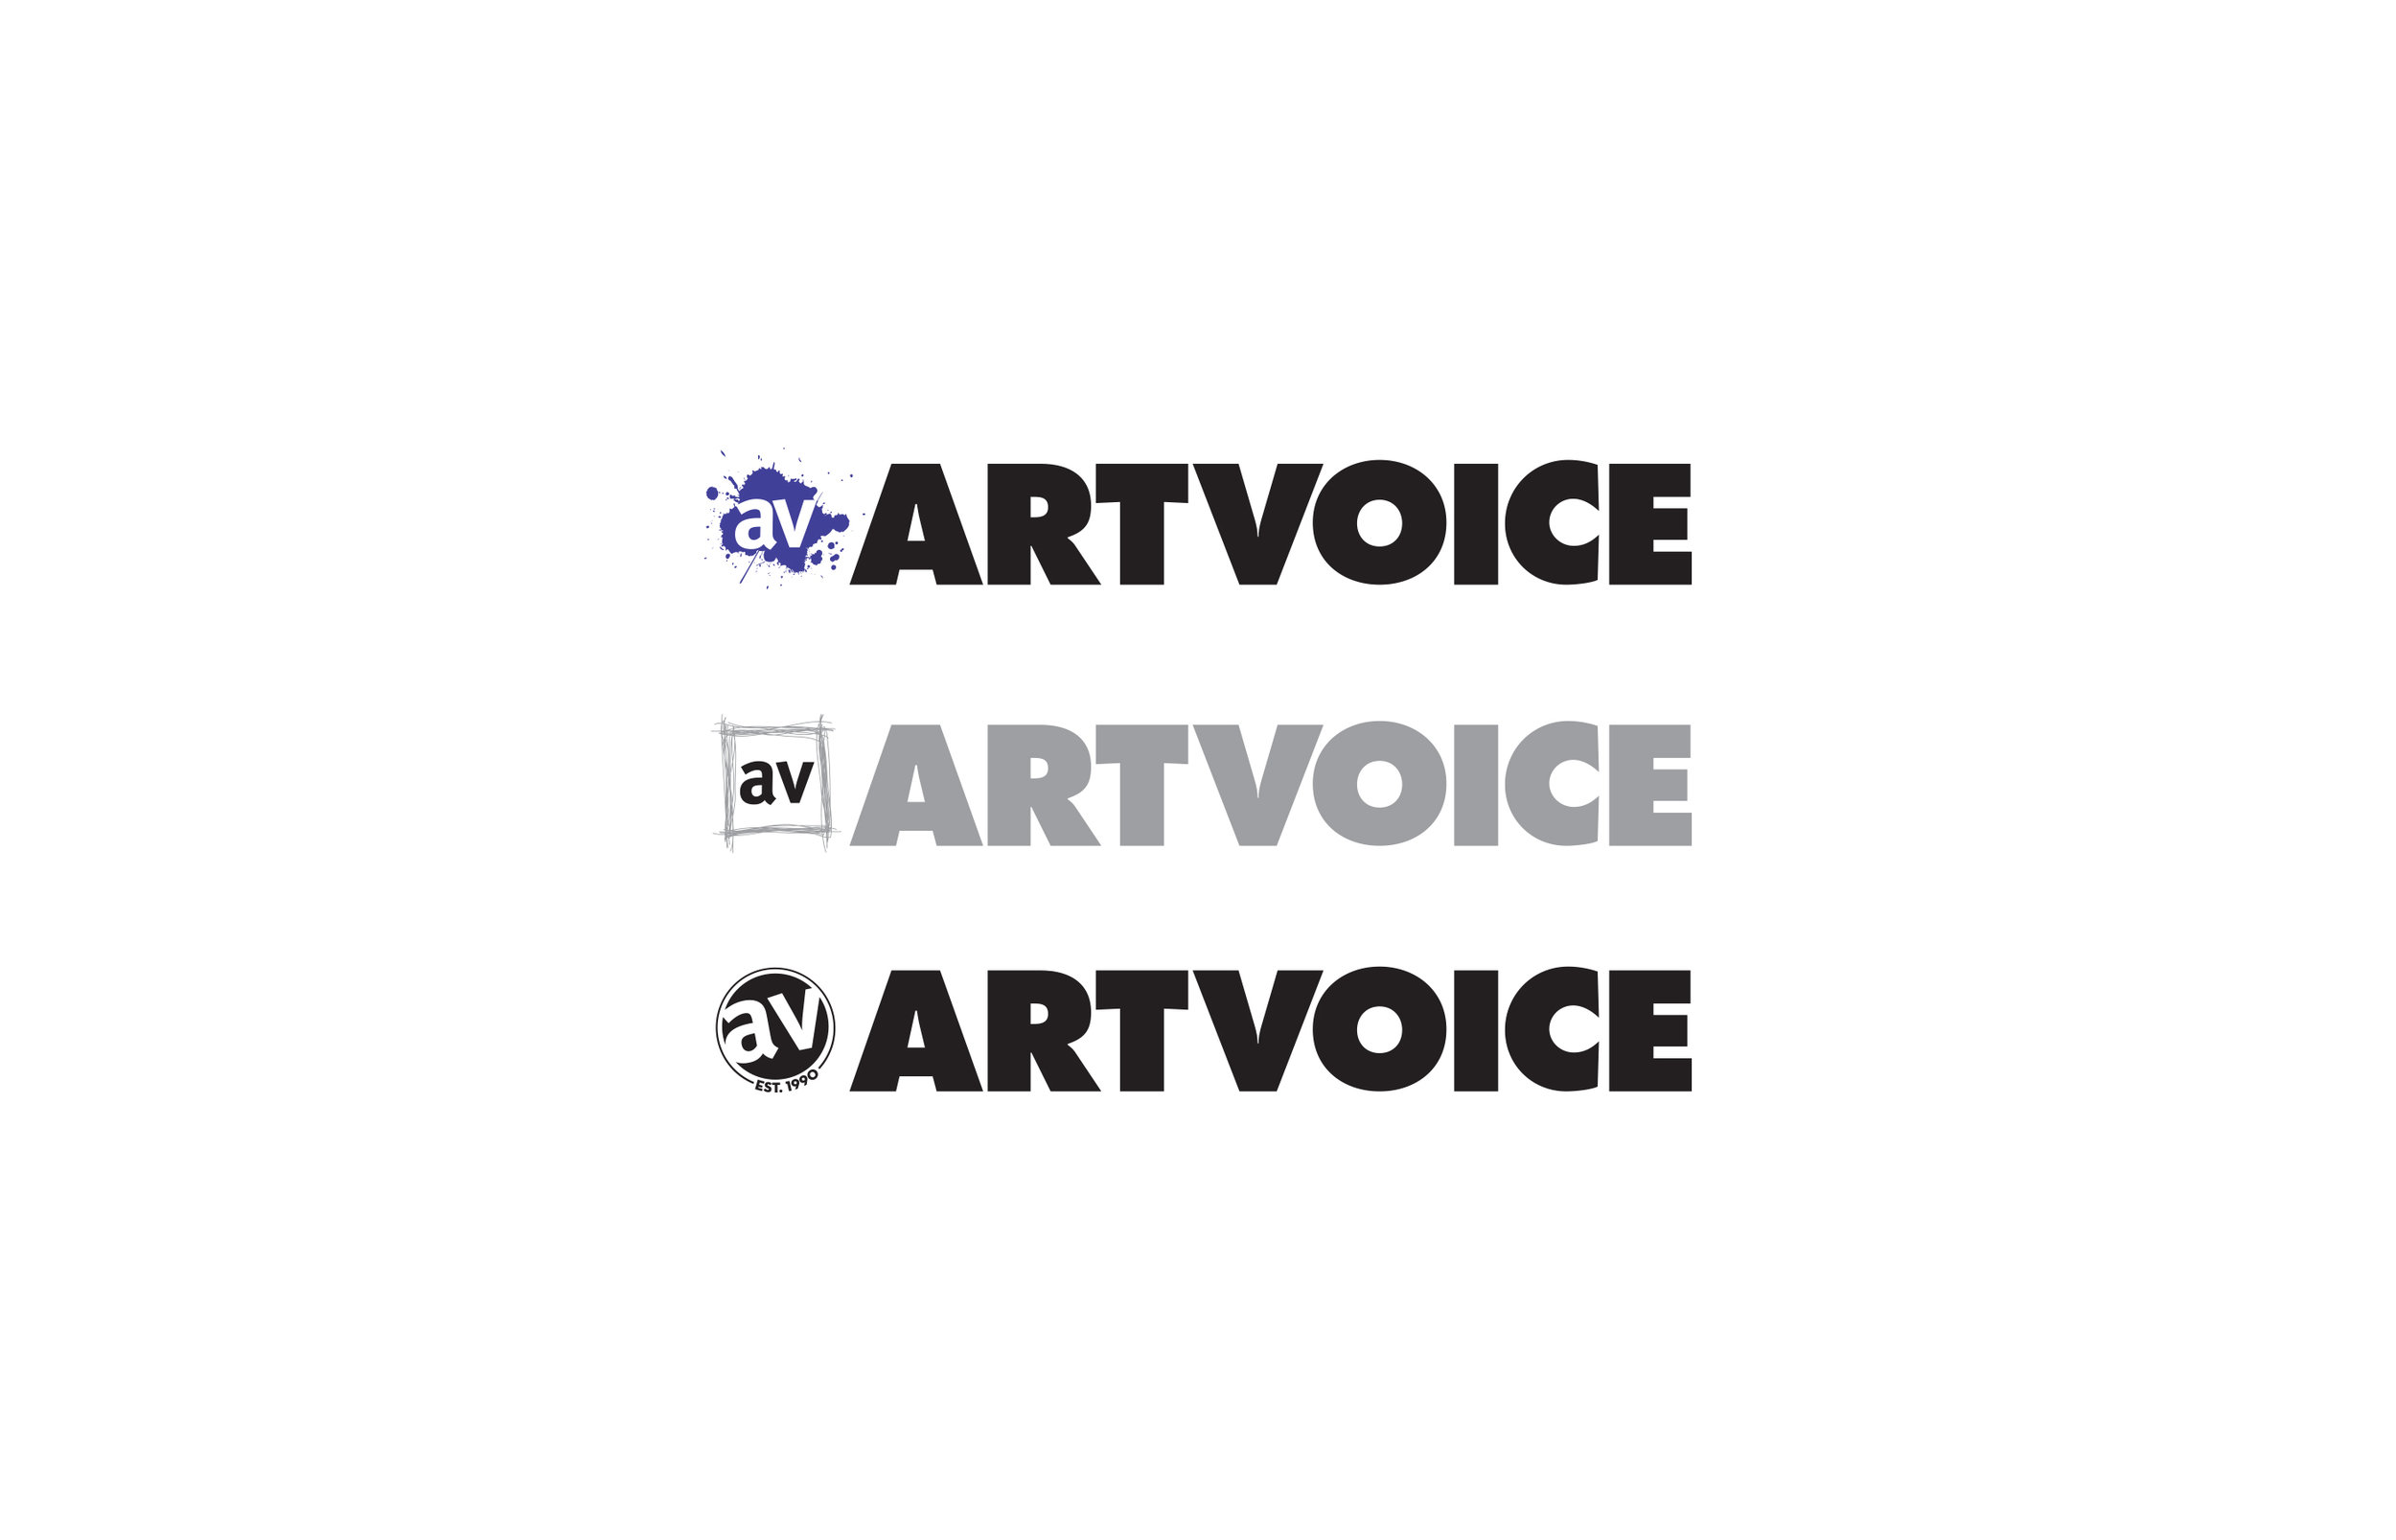 2018_TDP_2800x1800_Brand_Artvoice2.jpg